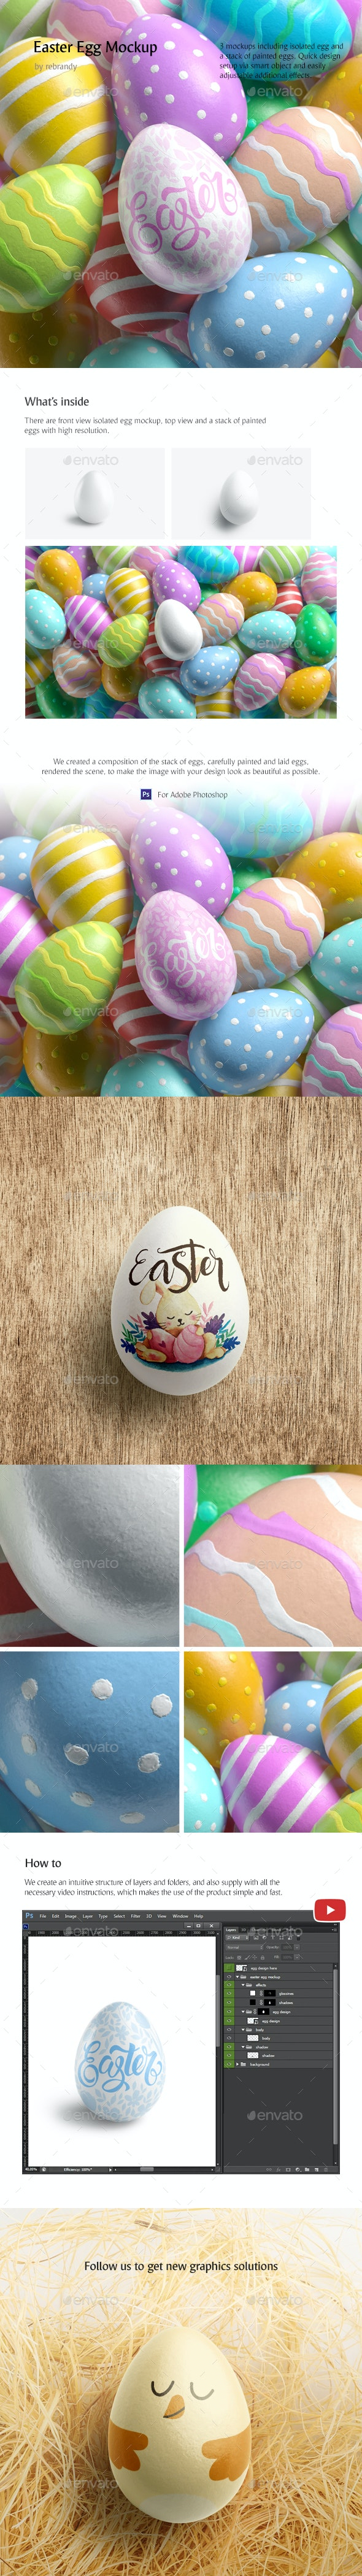 Easter Egg Mockup - Product Mock-Ups Graphics